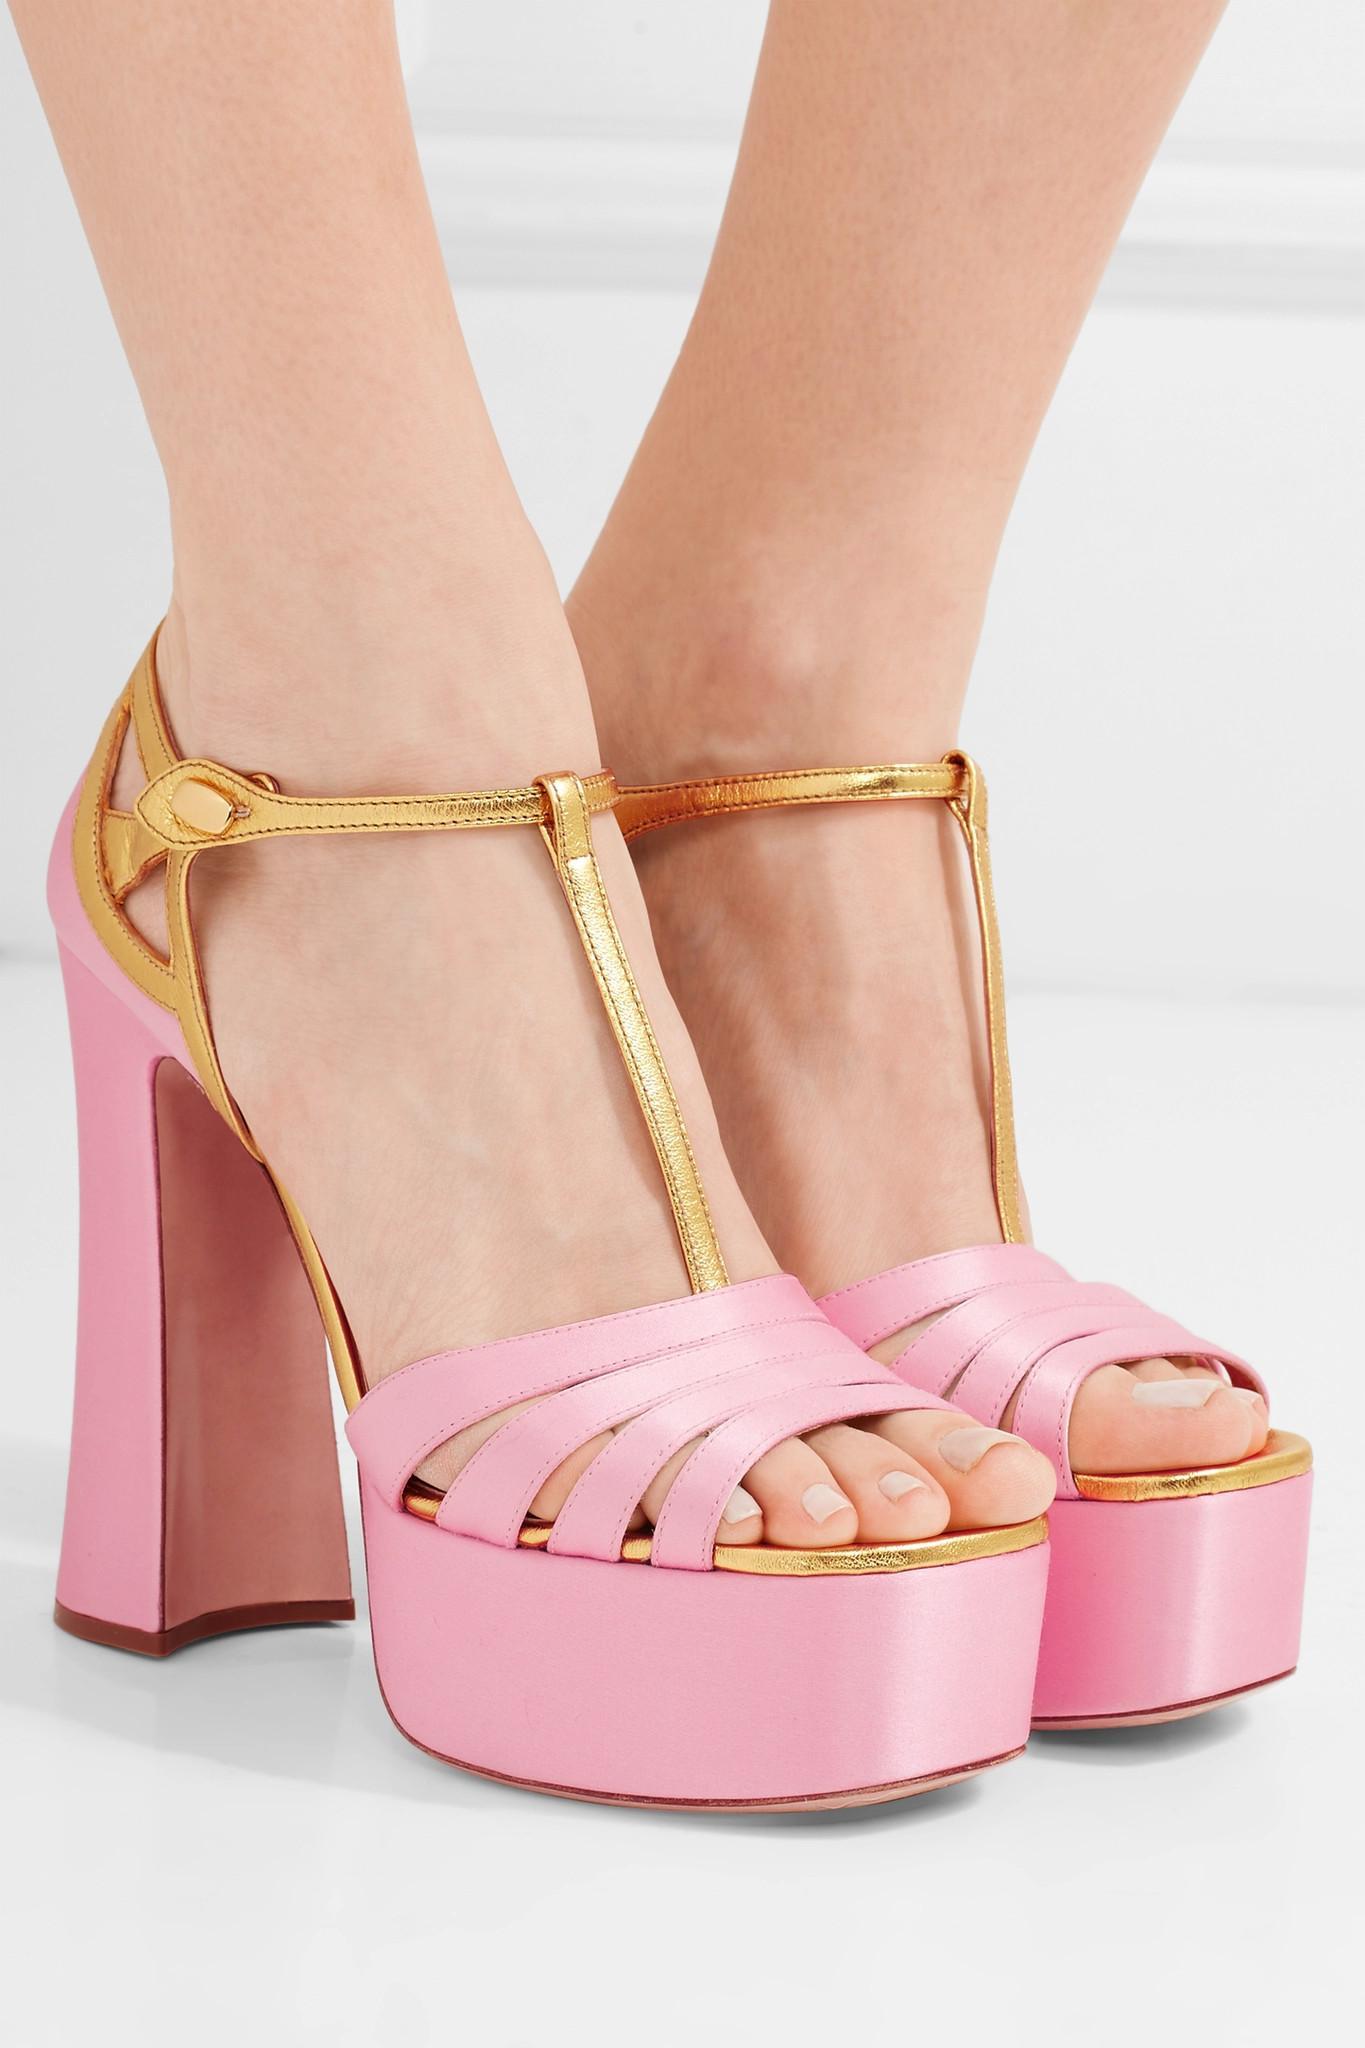 Miu Miu Leather Trimmed Satin Platform Sandals In Pink Lyst